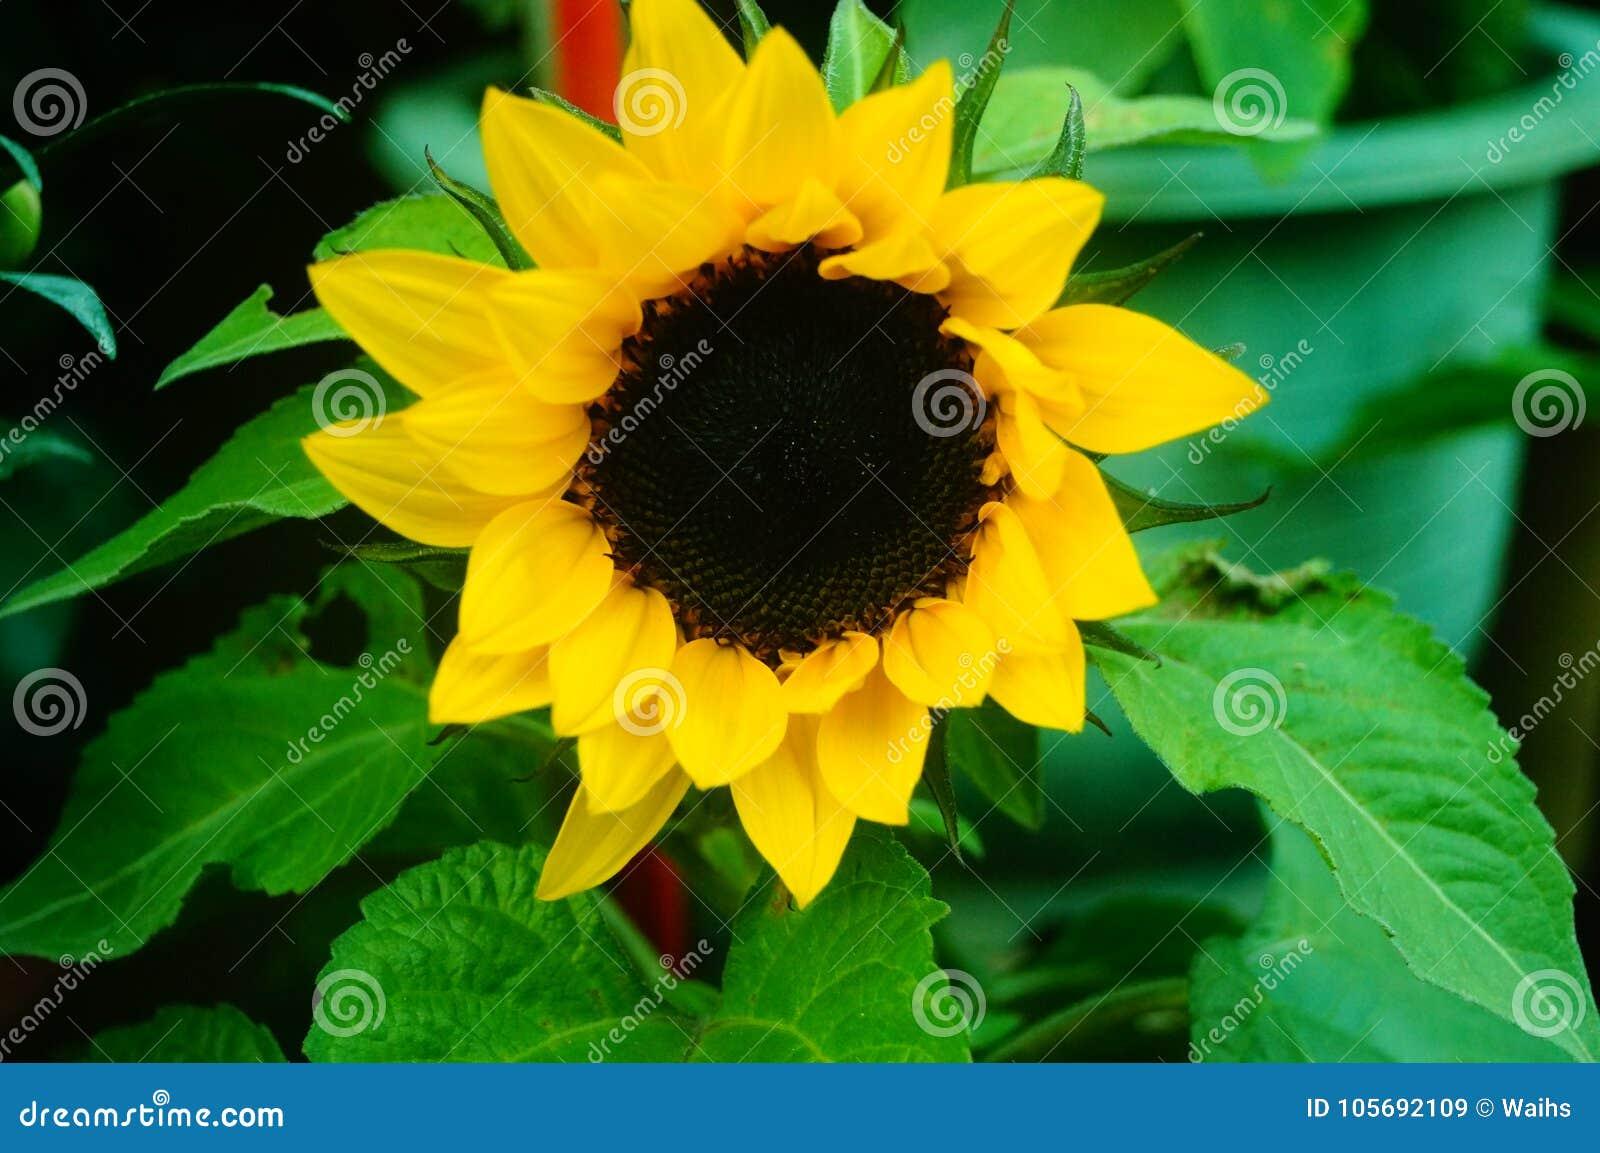 Sunflower very beautiful flowers stock image image of close download sunflower very beautiful flowers stock image image of close petals 105692109 izmirmasajfo